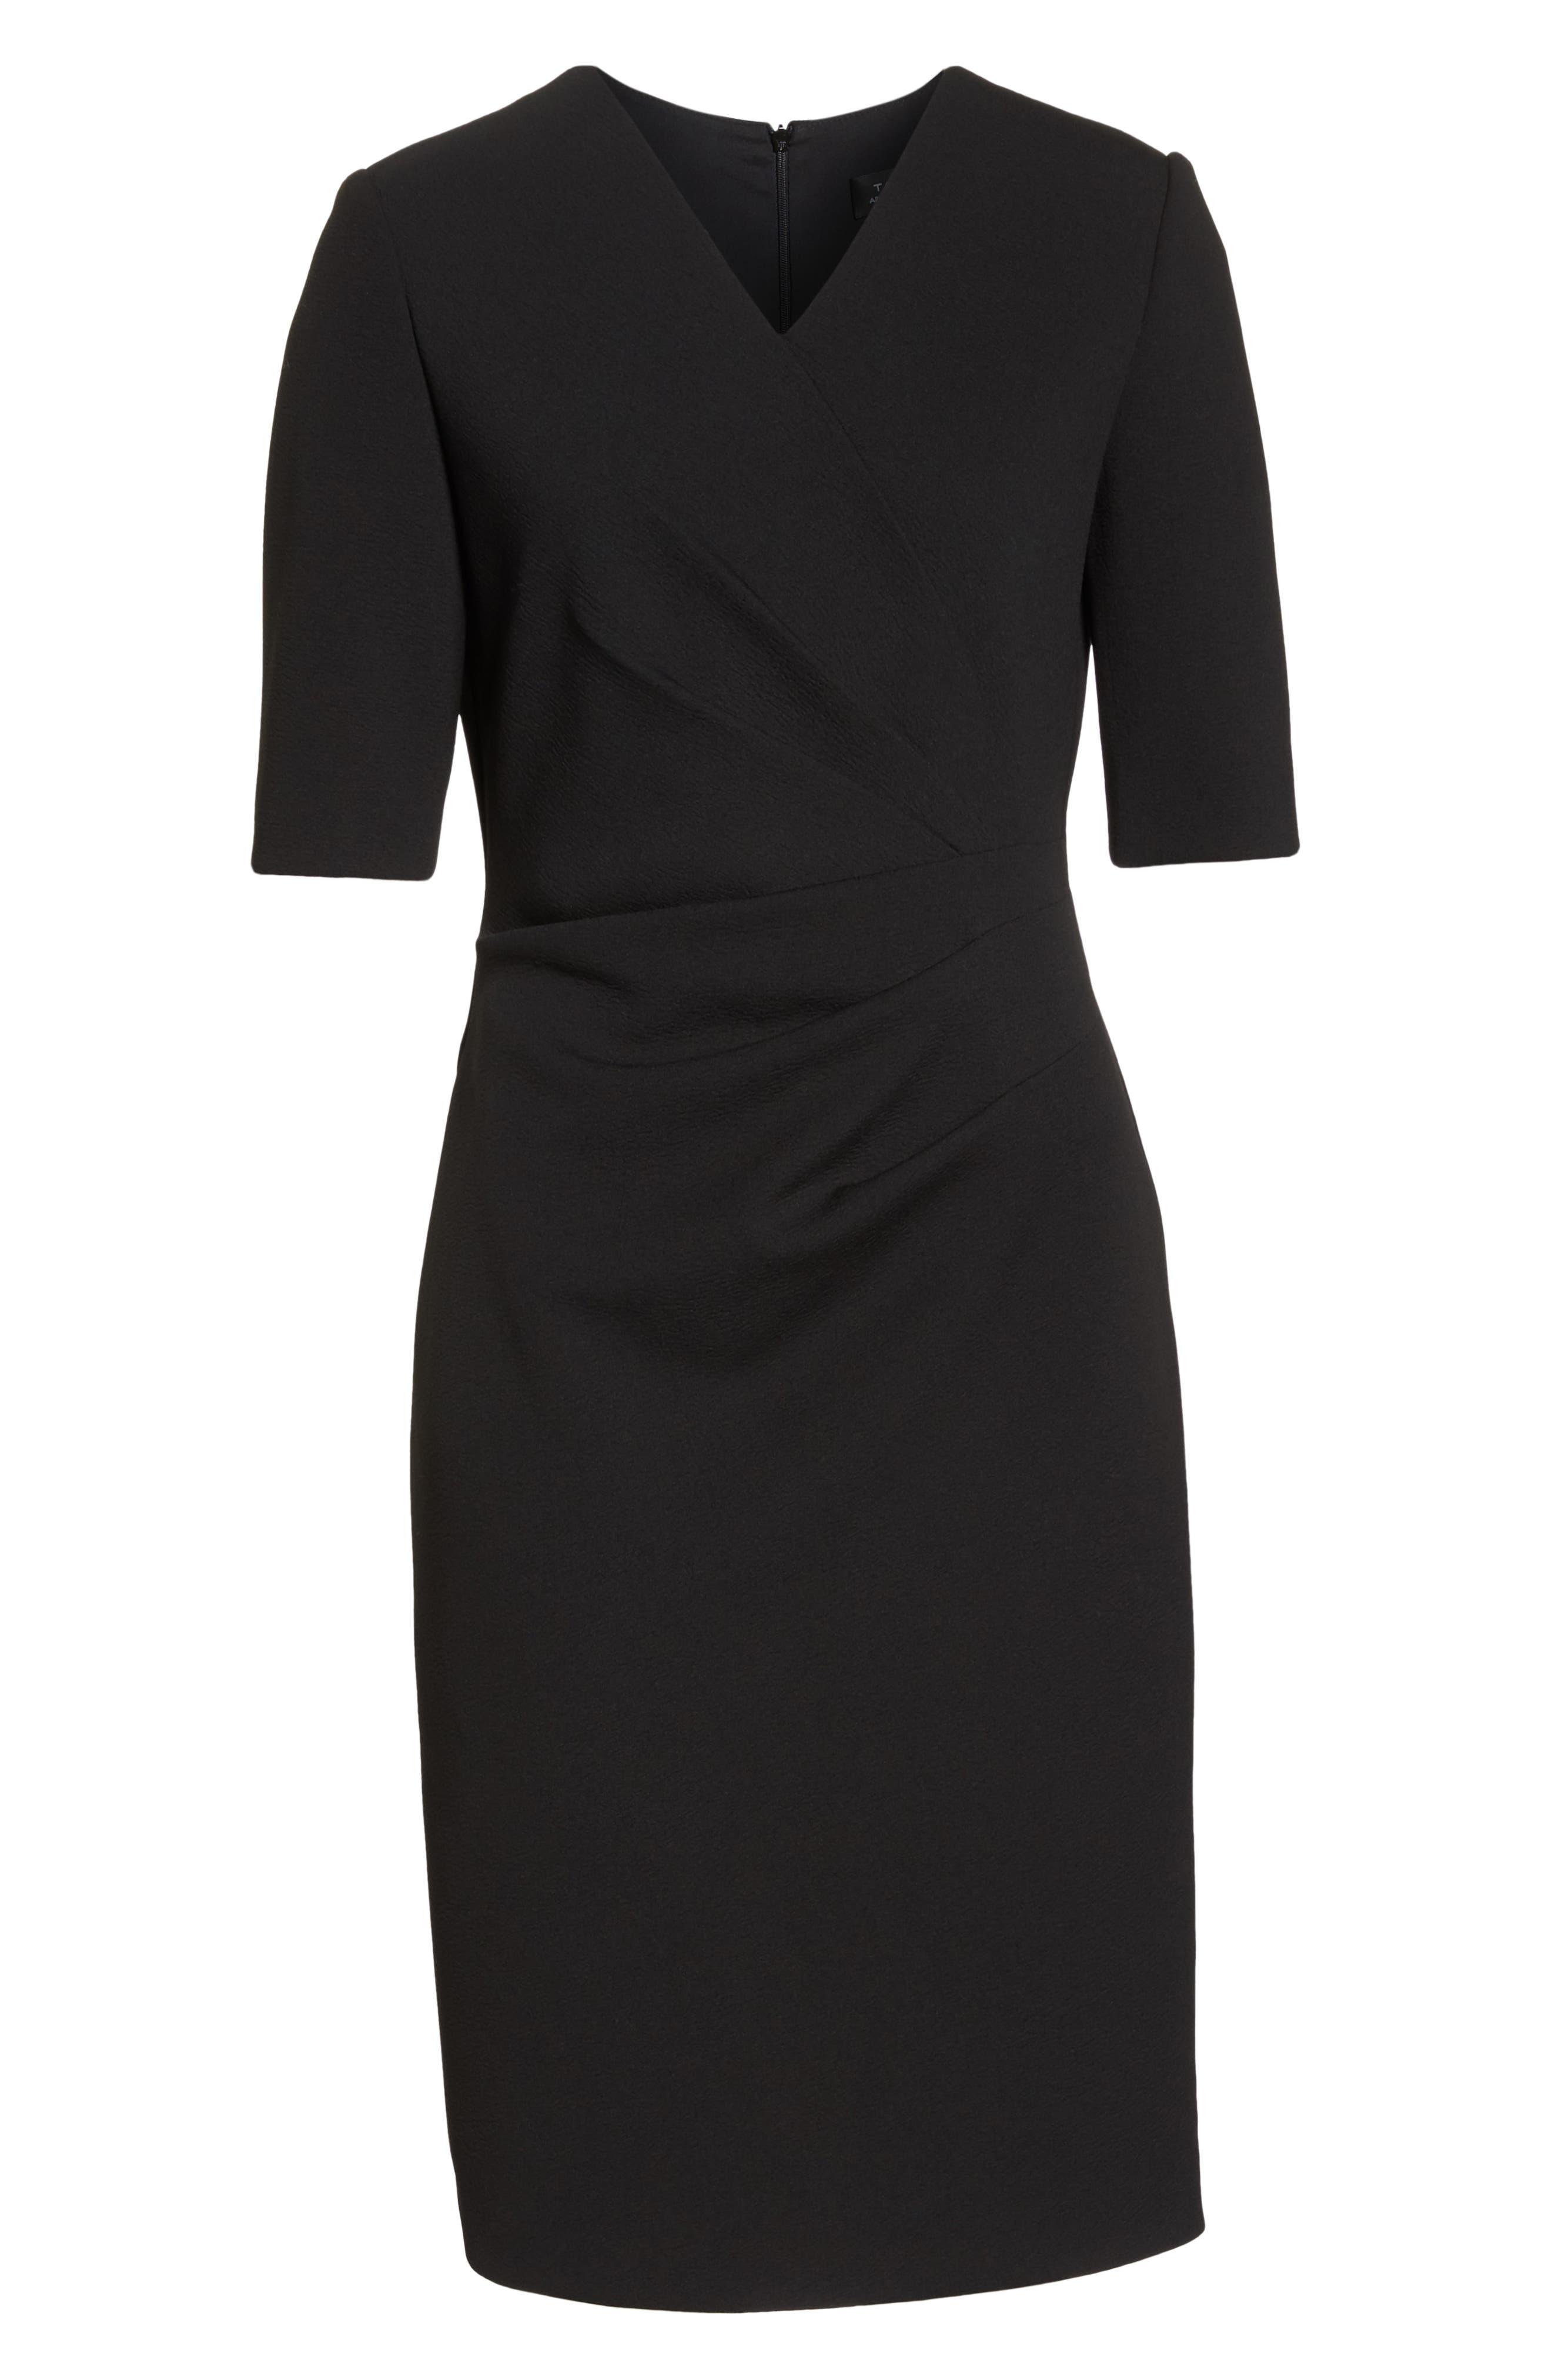 TAHARI, Scuba Crepe Sheath Dress, Alternate thumbnail 7, color, BLACK